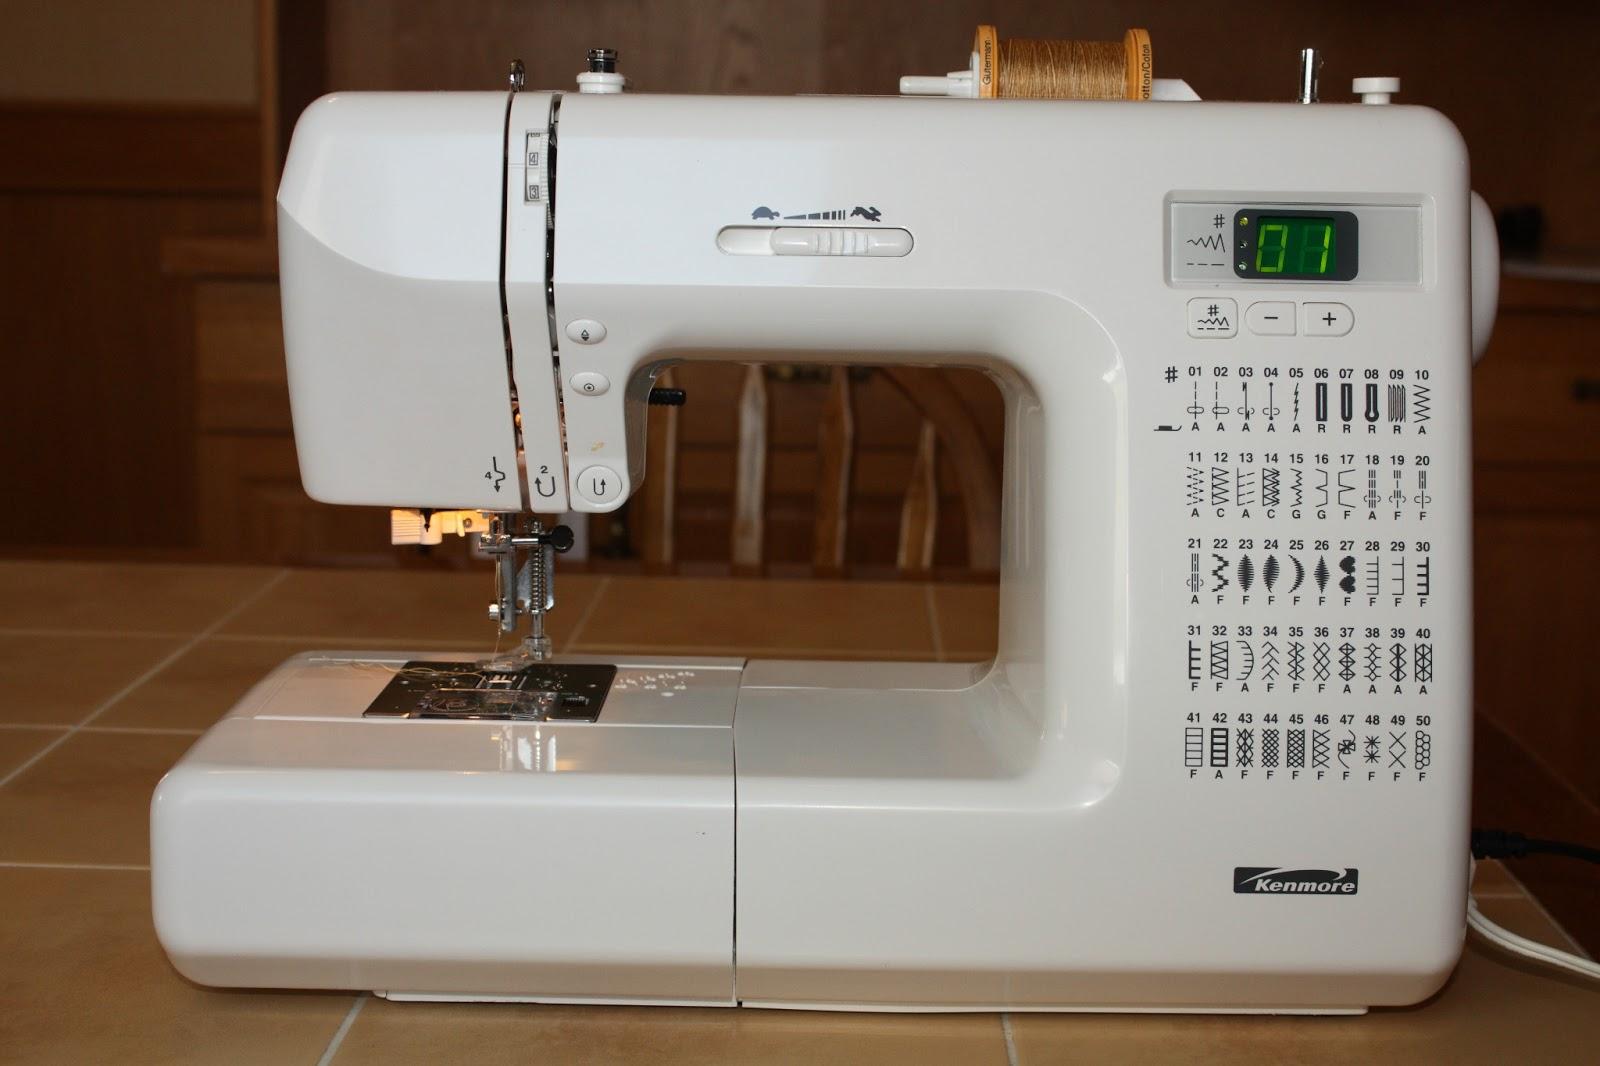 devoted quilter meet my machine rh devotedquilter blogspot com Kenmore Sewing Machine Parts Sears Kenmore Sewing Machine